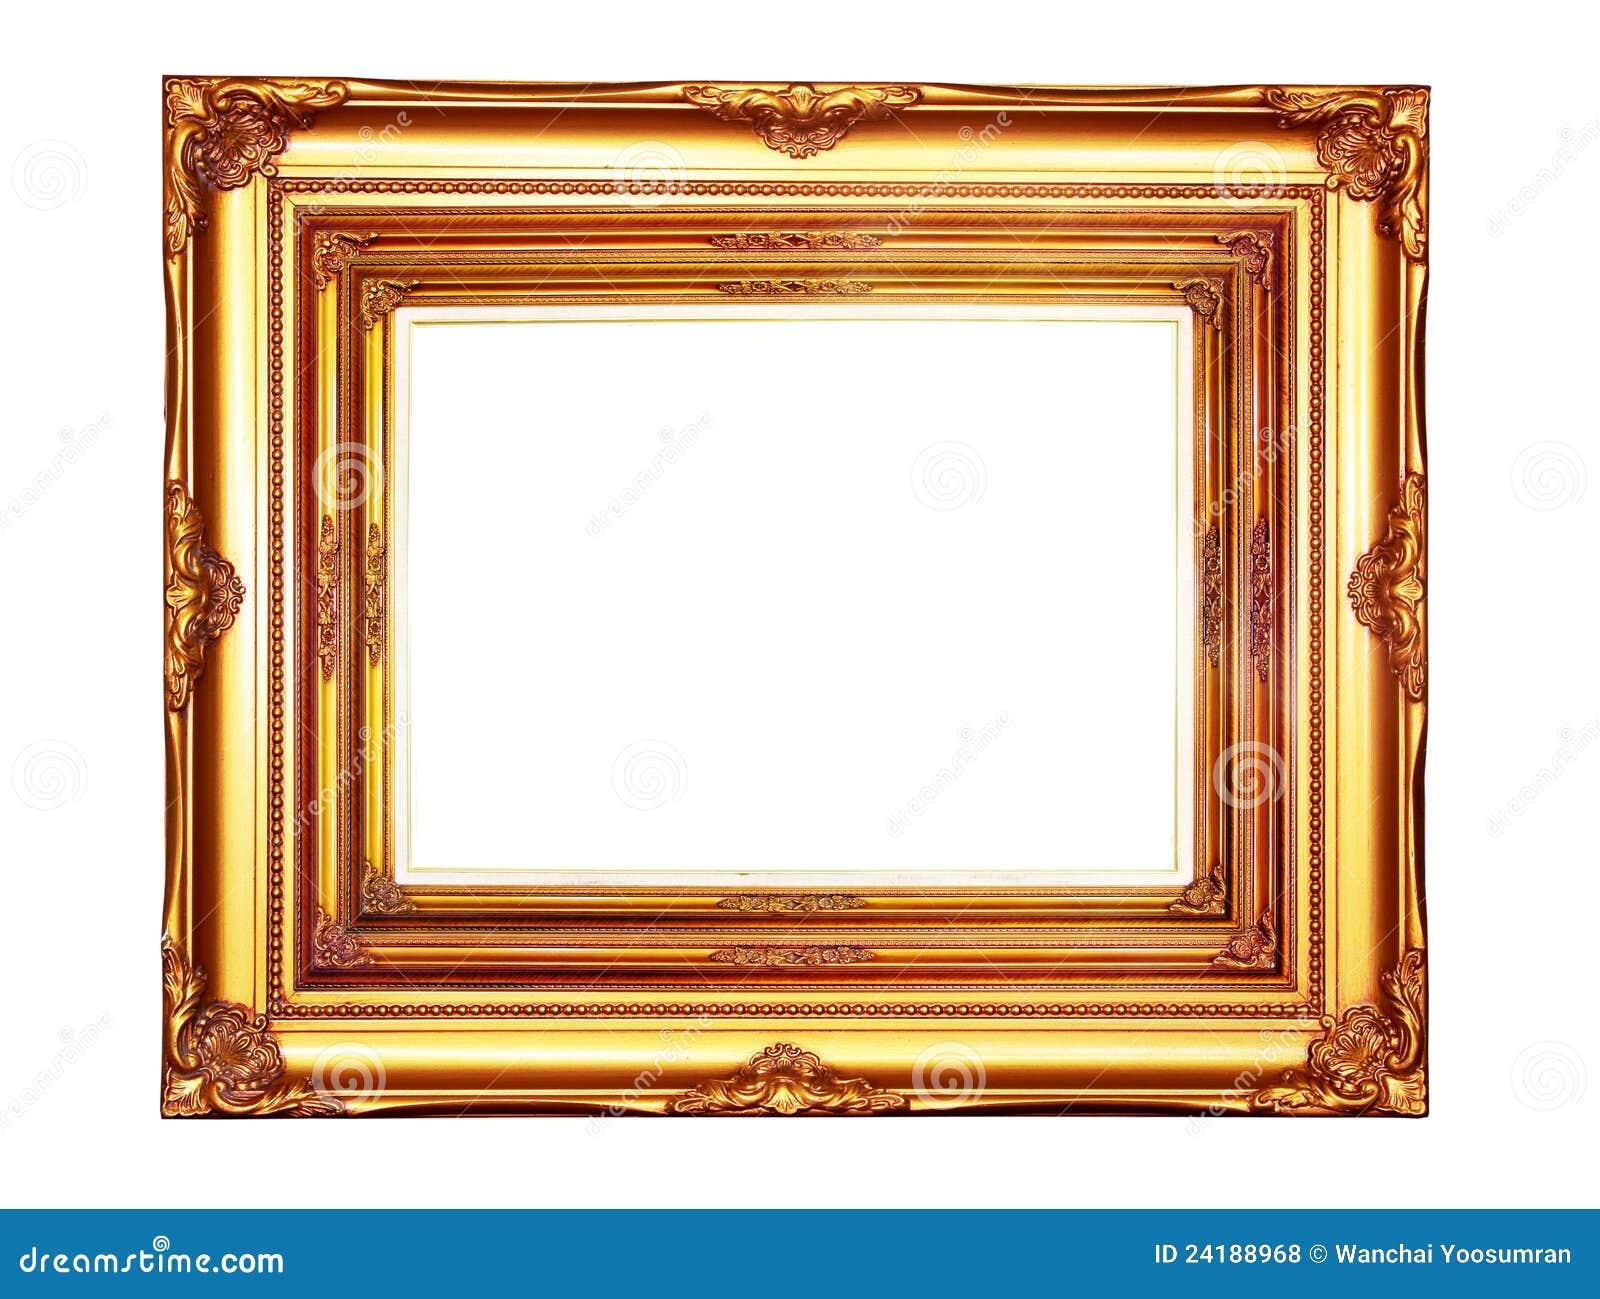 Vintage Wood Frame : Vintage Wood Photo Frame Royalty Free Stock Photos - Image: 24188968